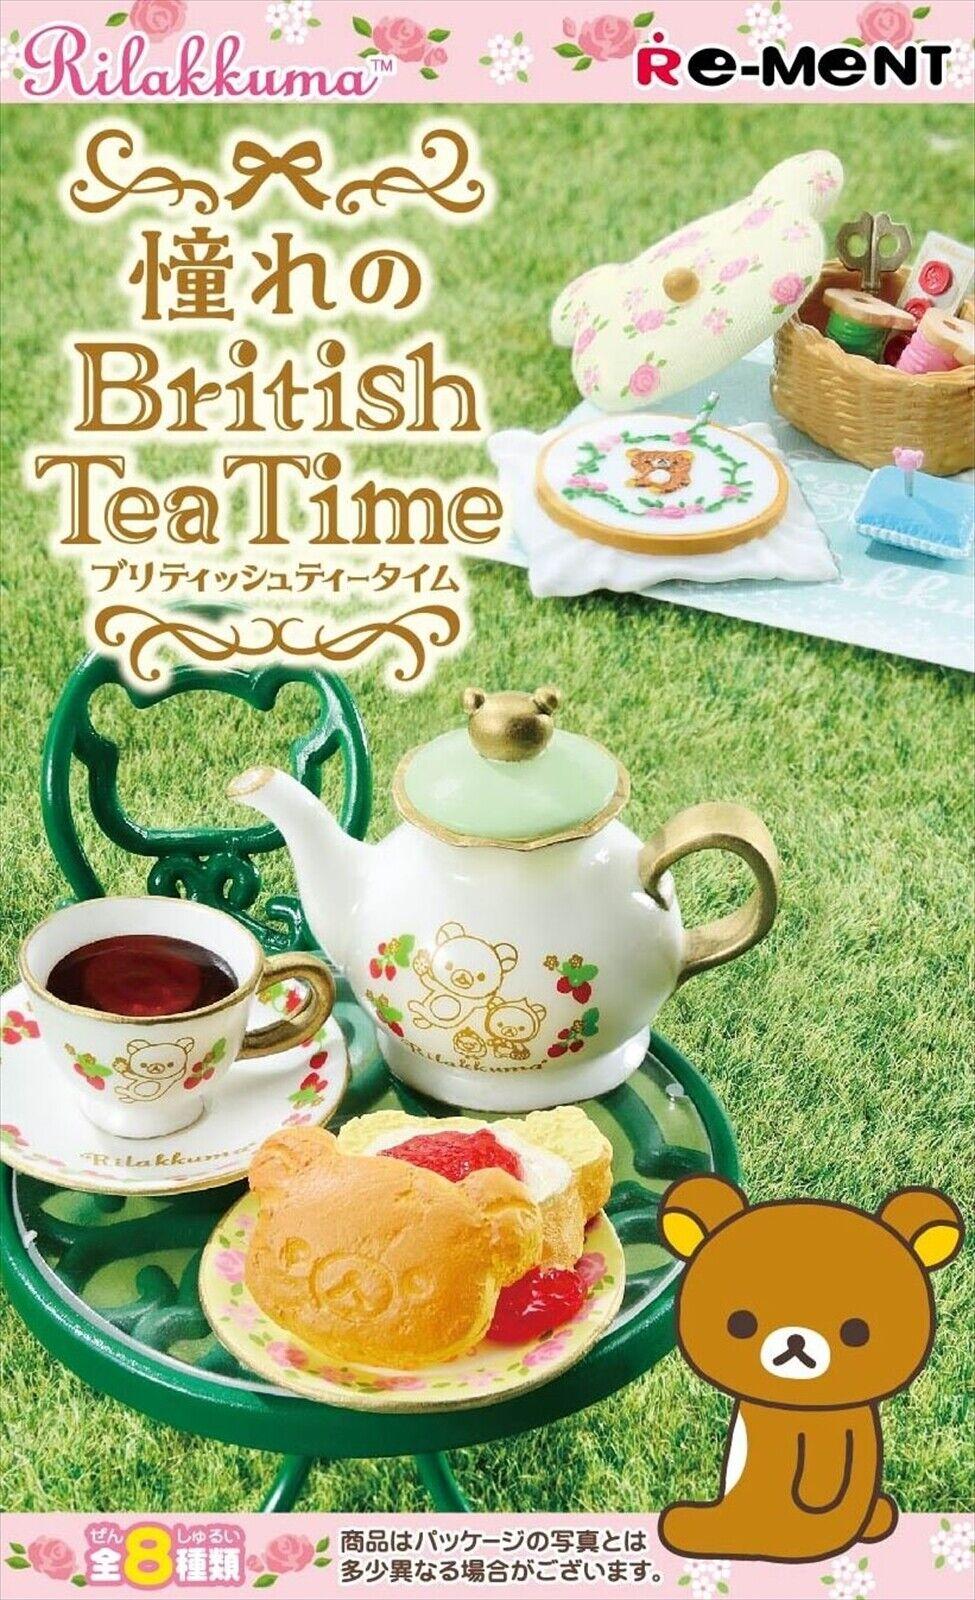 Re-ment Miniature British Tea Time Full Set 8 Rilakkuma Relax Bear Japan  NEW